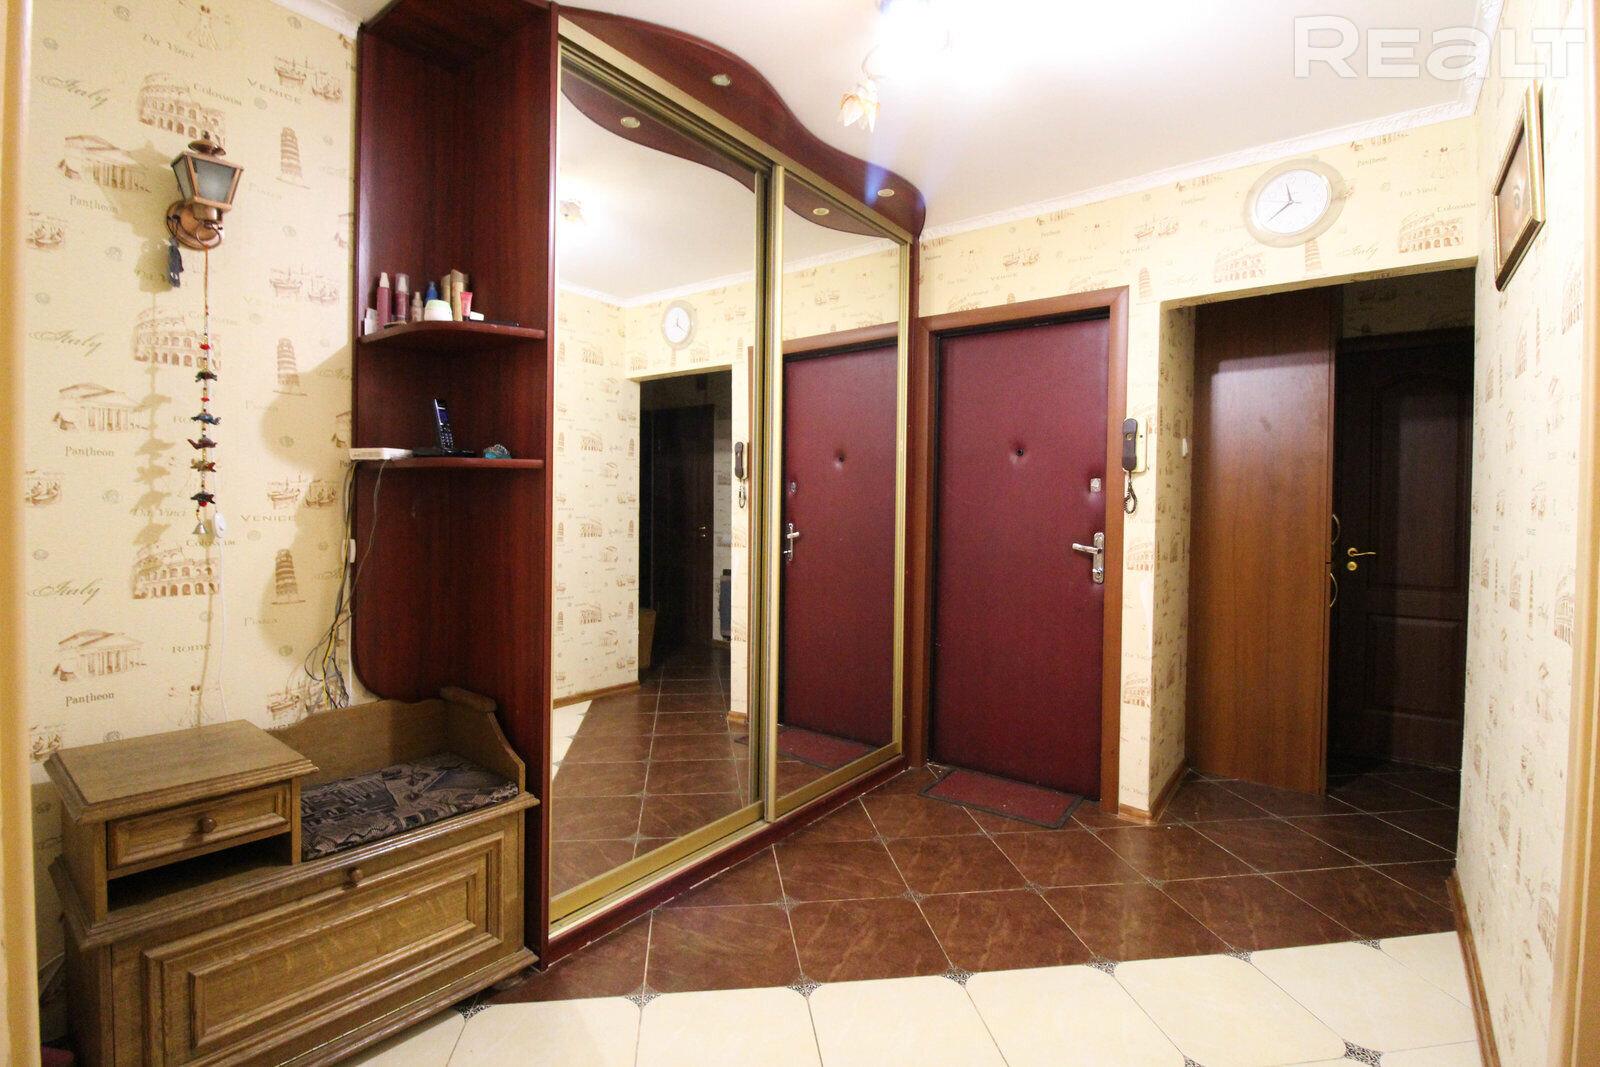 Продается 4-х комнатная квартира, ул. Лынькова д.15-В - фото №9